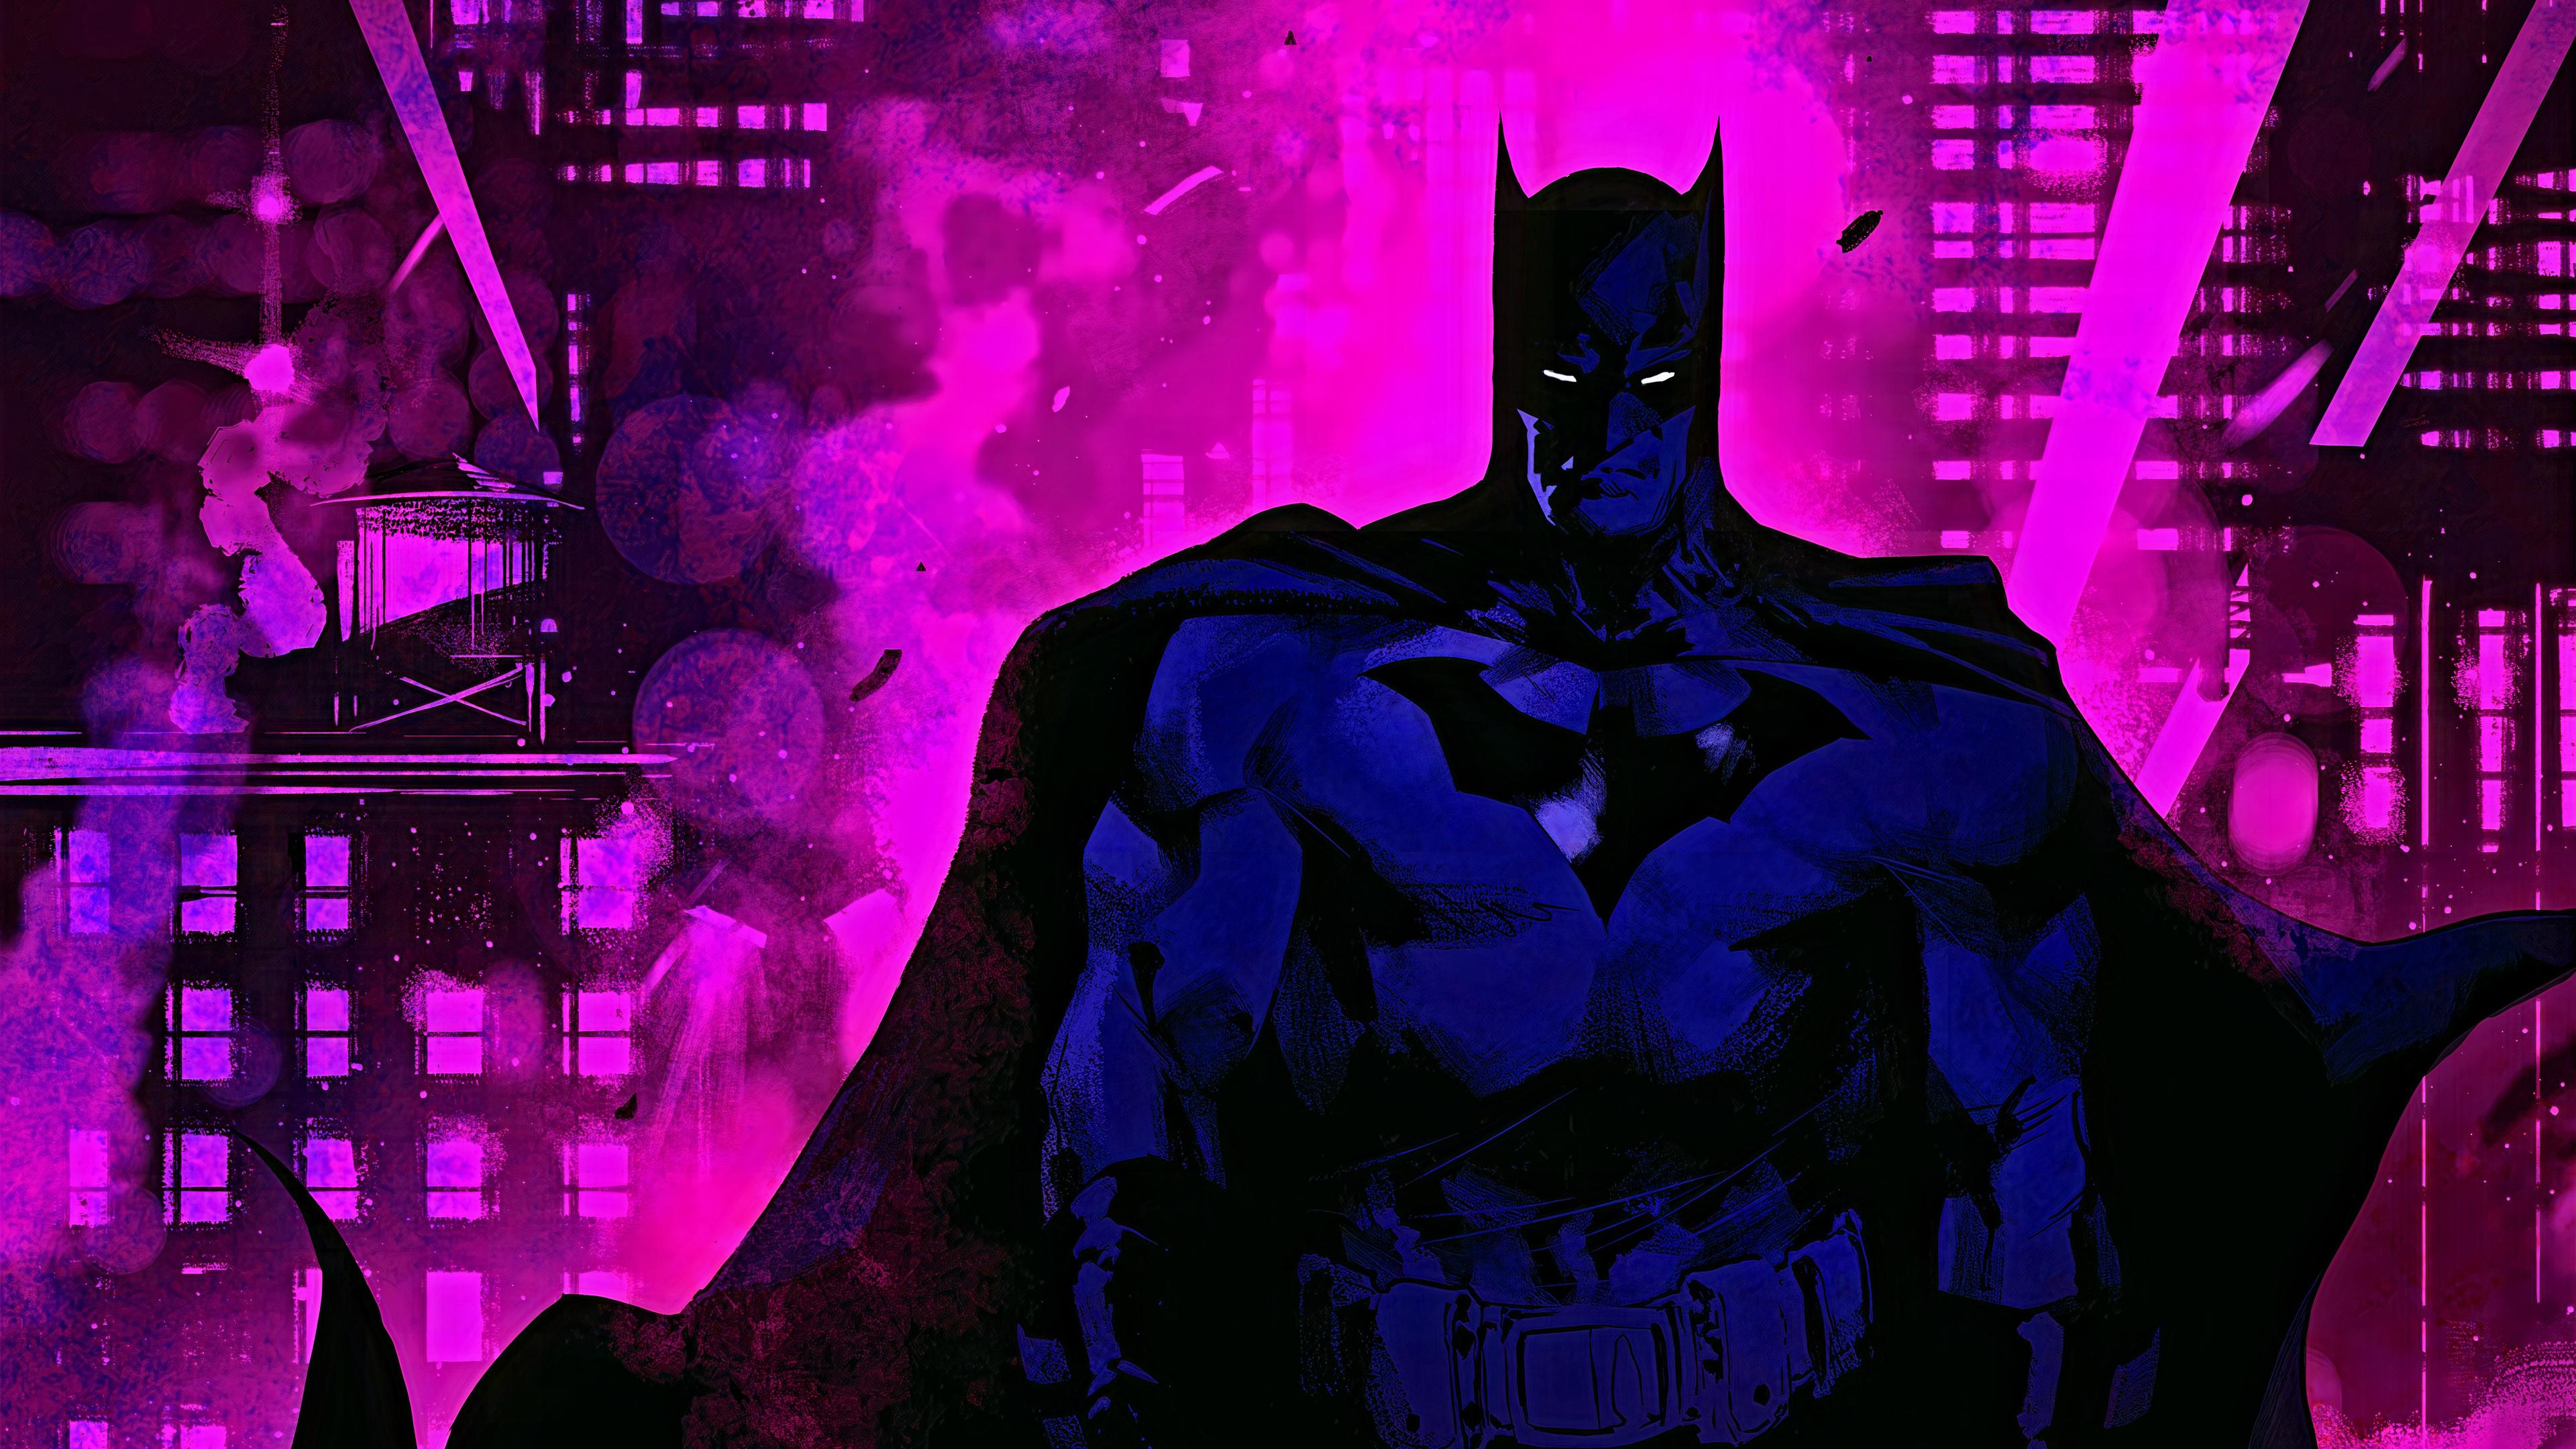 batman purple theme 1602351839 - Batman Purple Theme - Batman Purple Theme wallpapers 4k